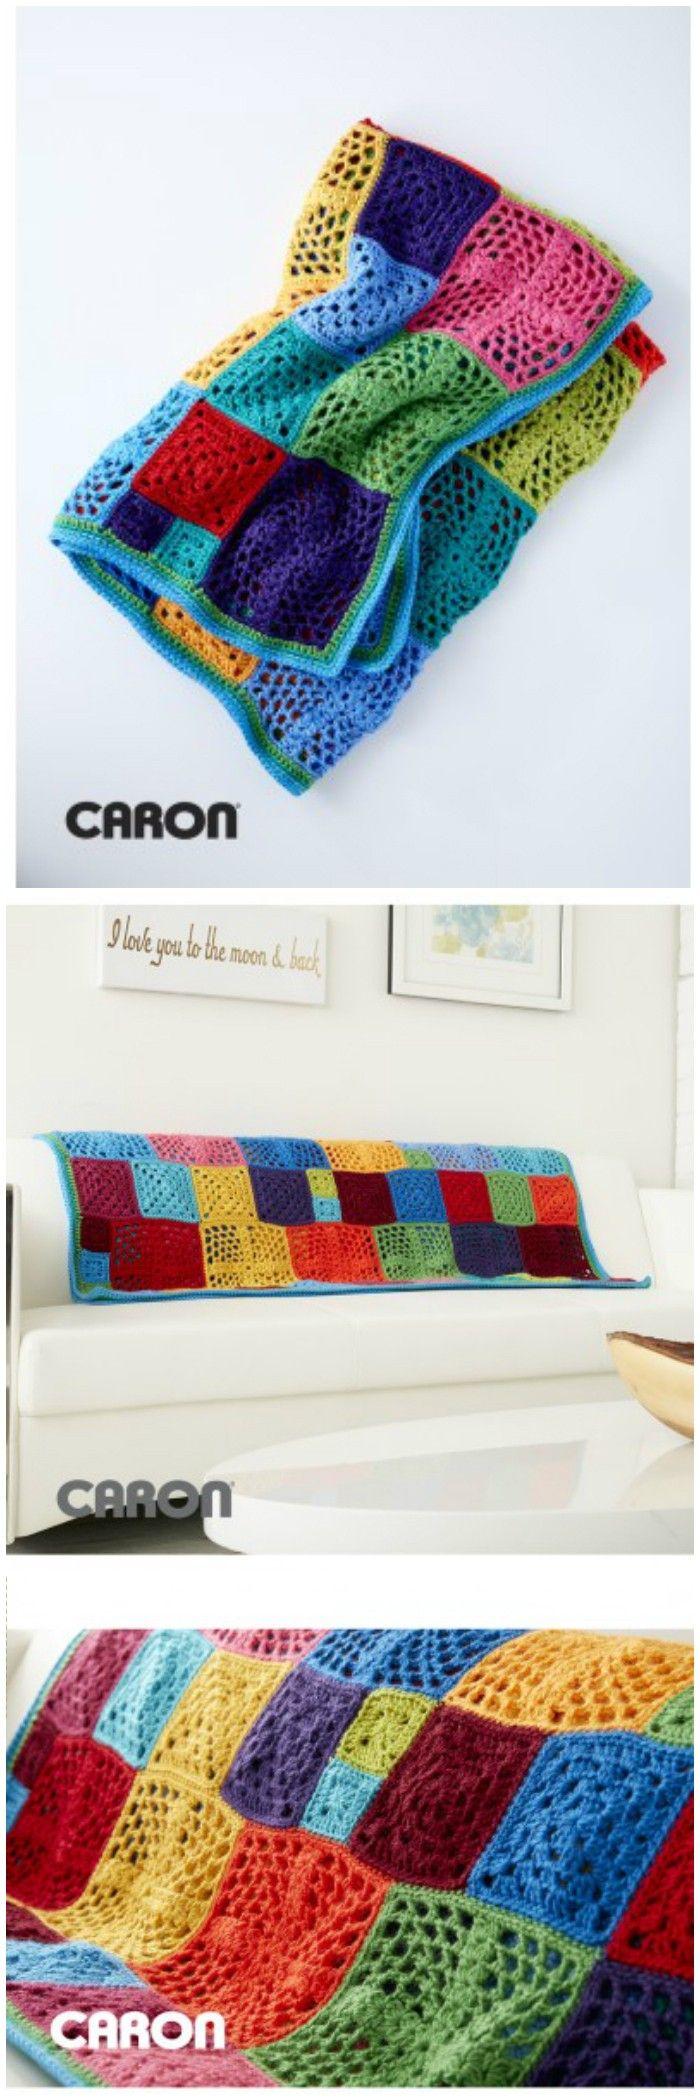 Free Crochet Blanket Patterns – Free Patterns | Pinterest | Manta